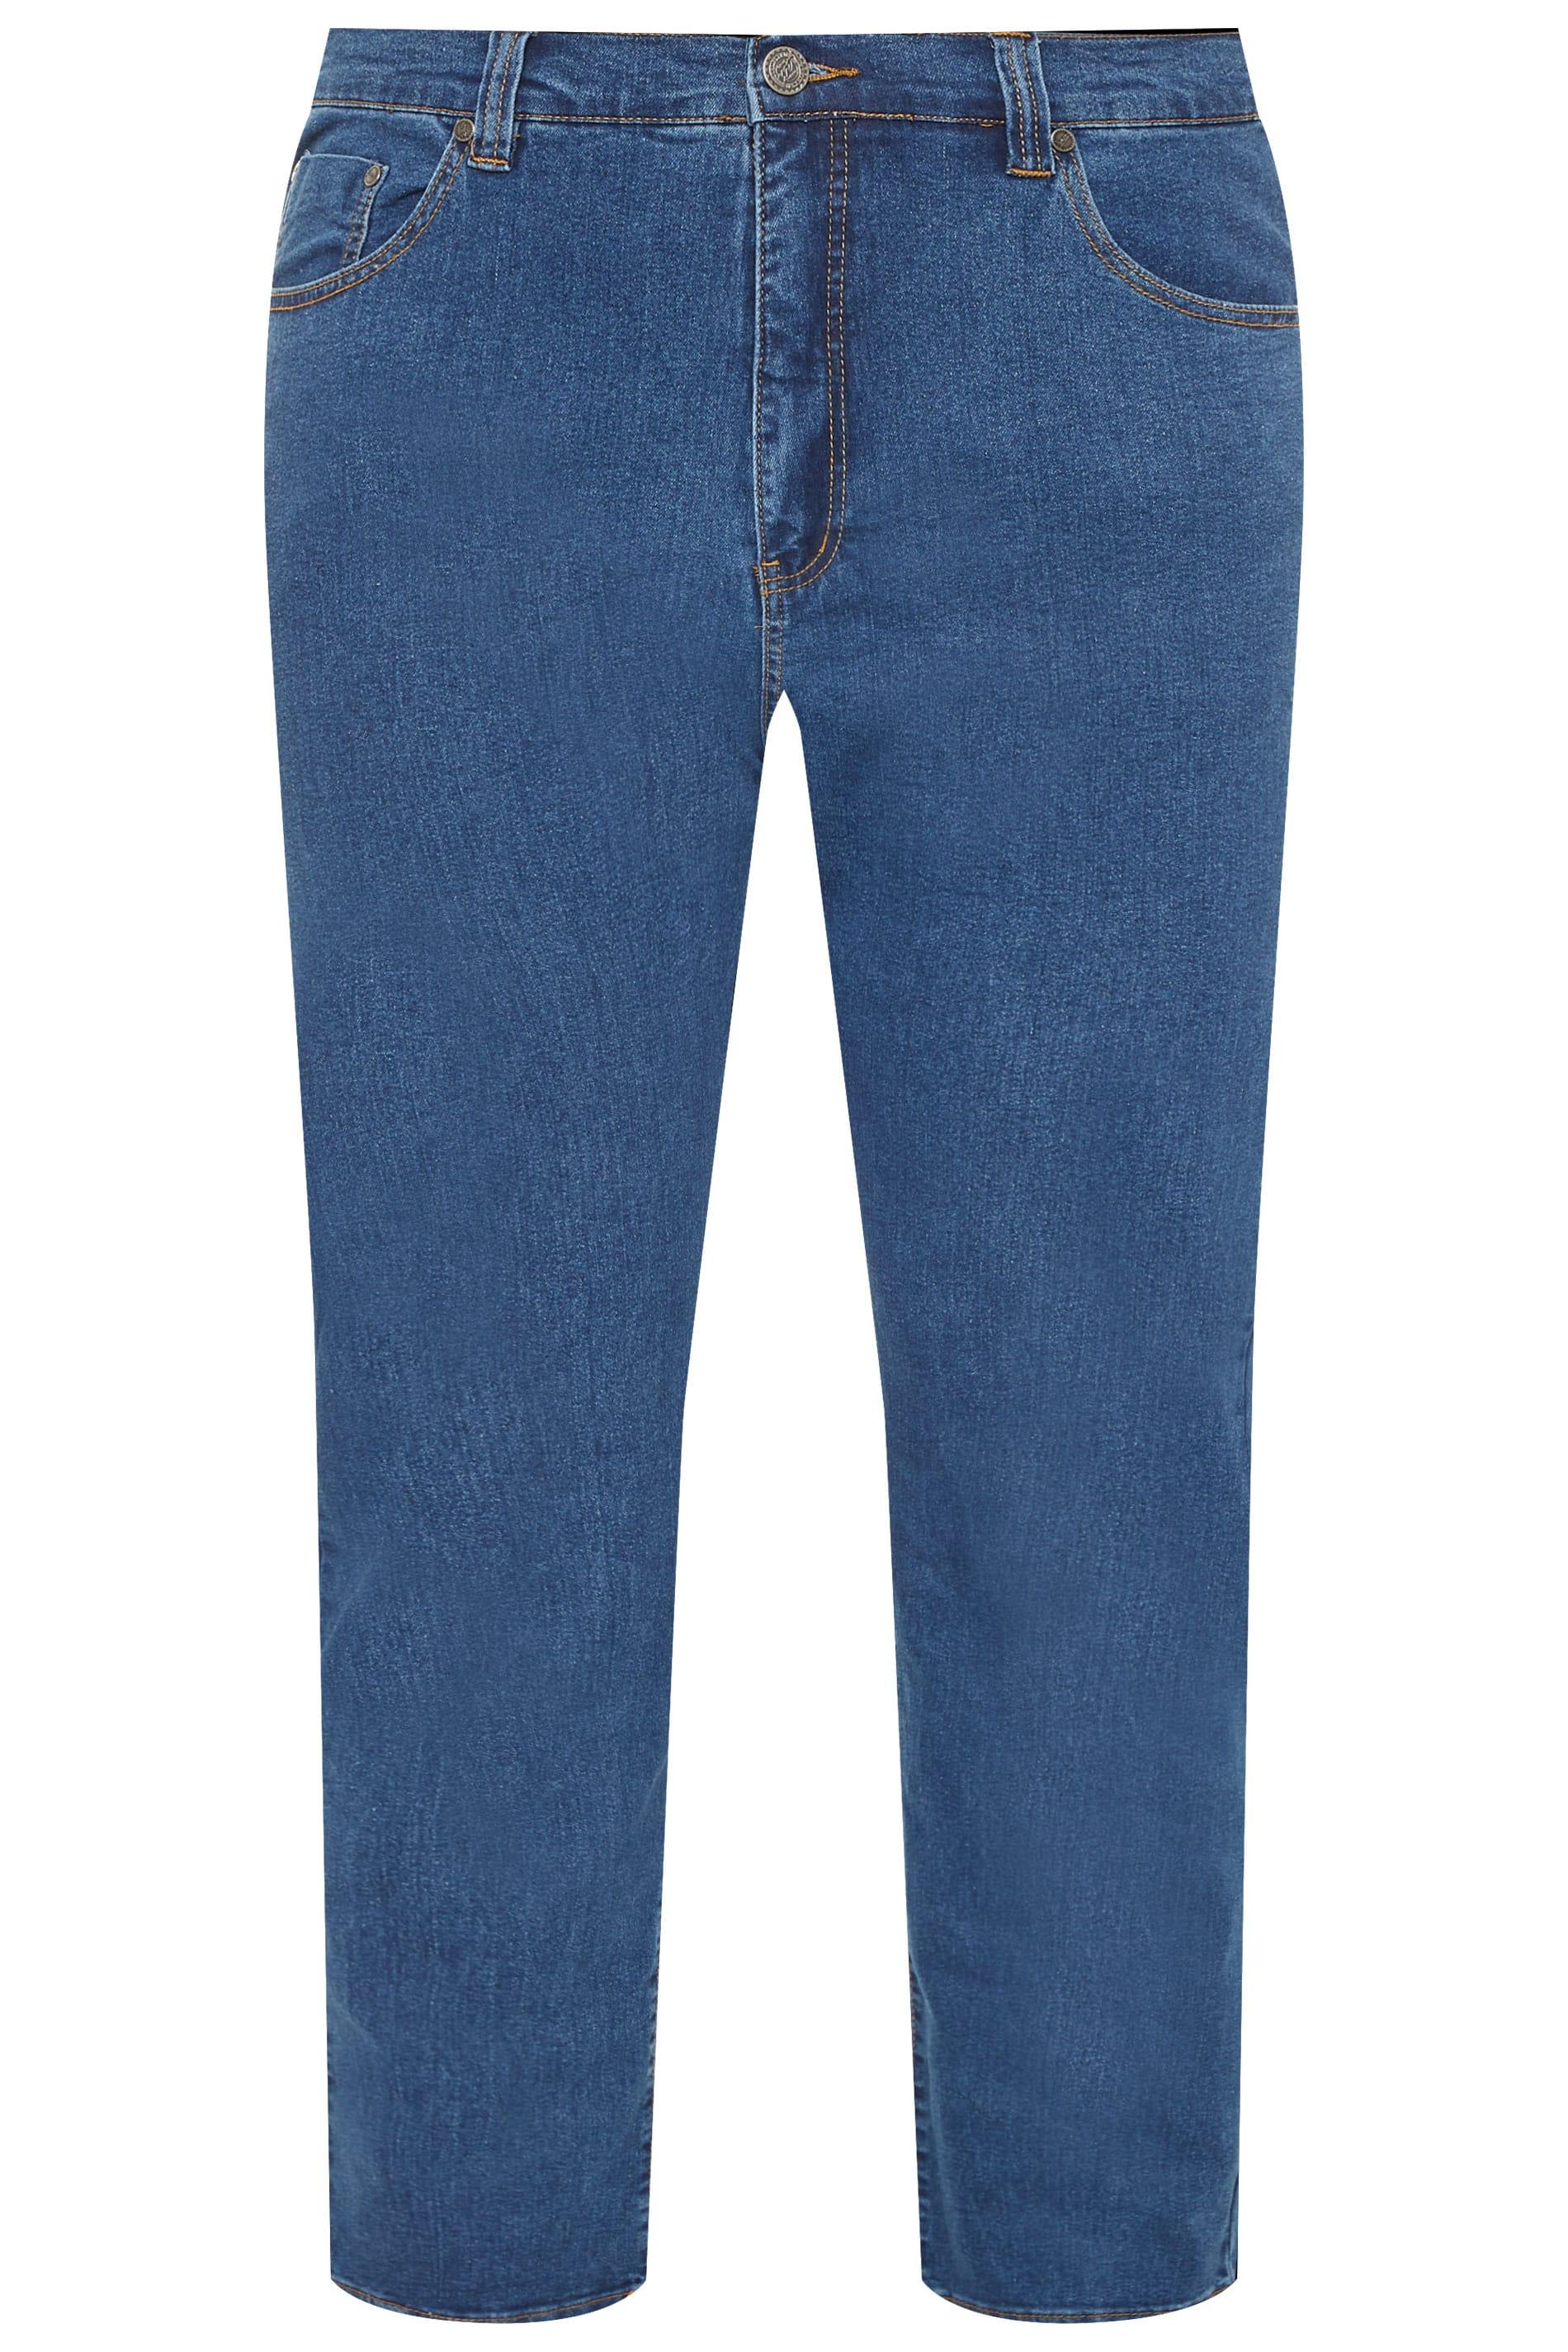 KAM Blue Stone Wash Stretch Jeans